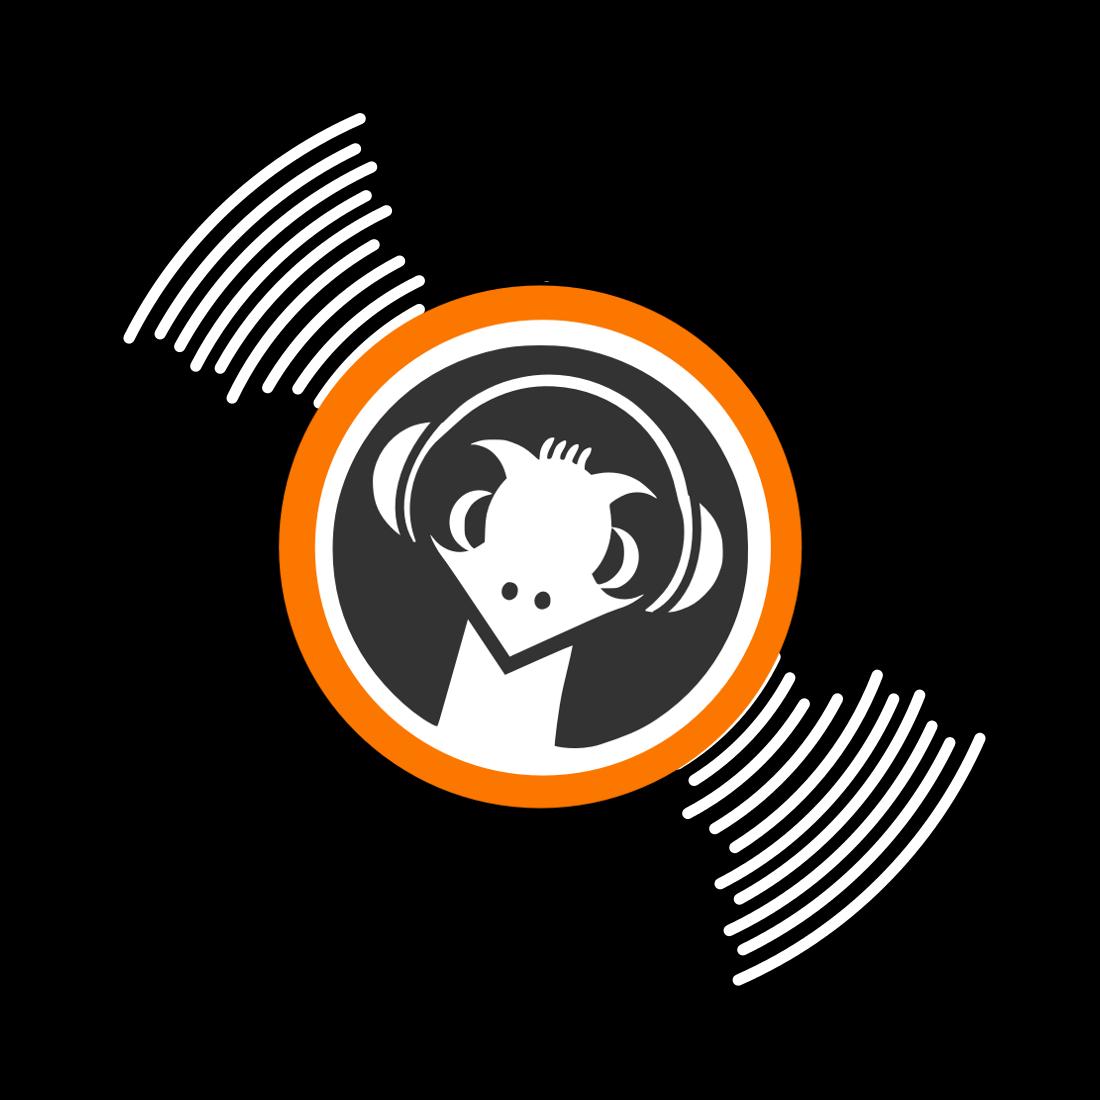 Stormtrooper (radio edit)